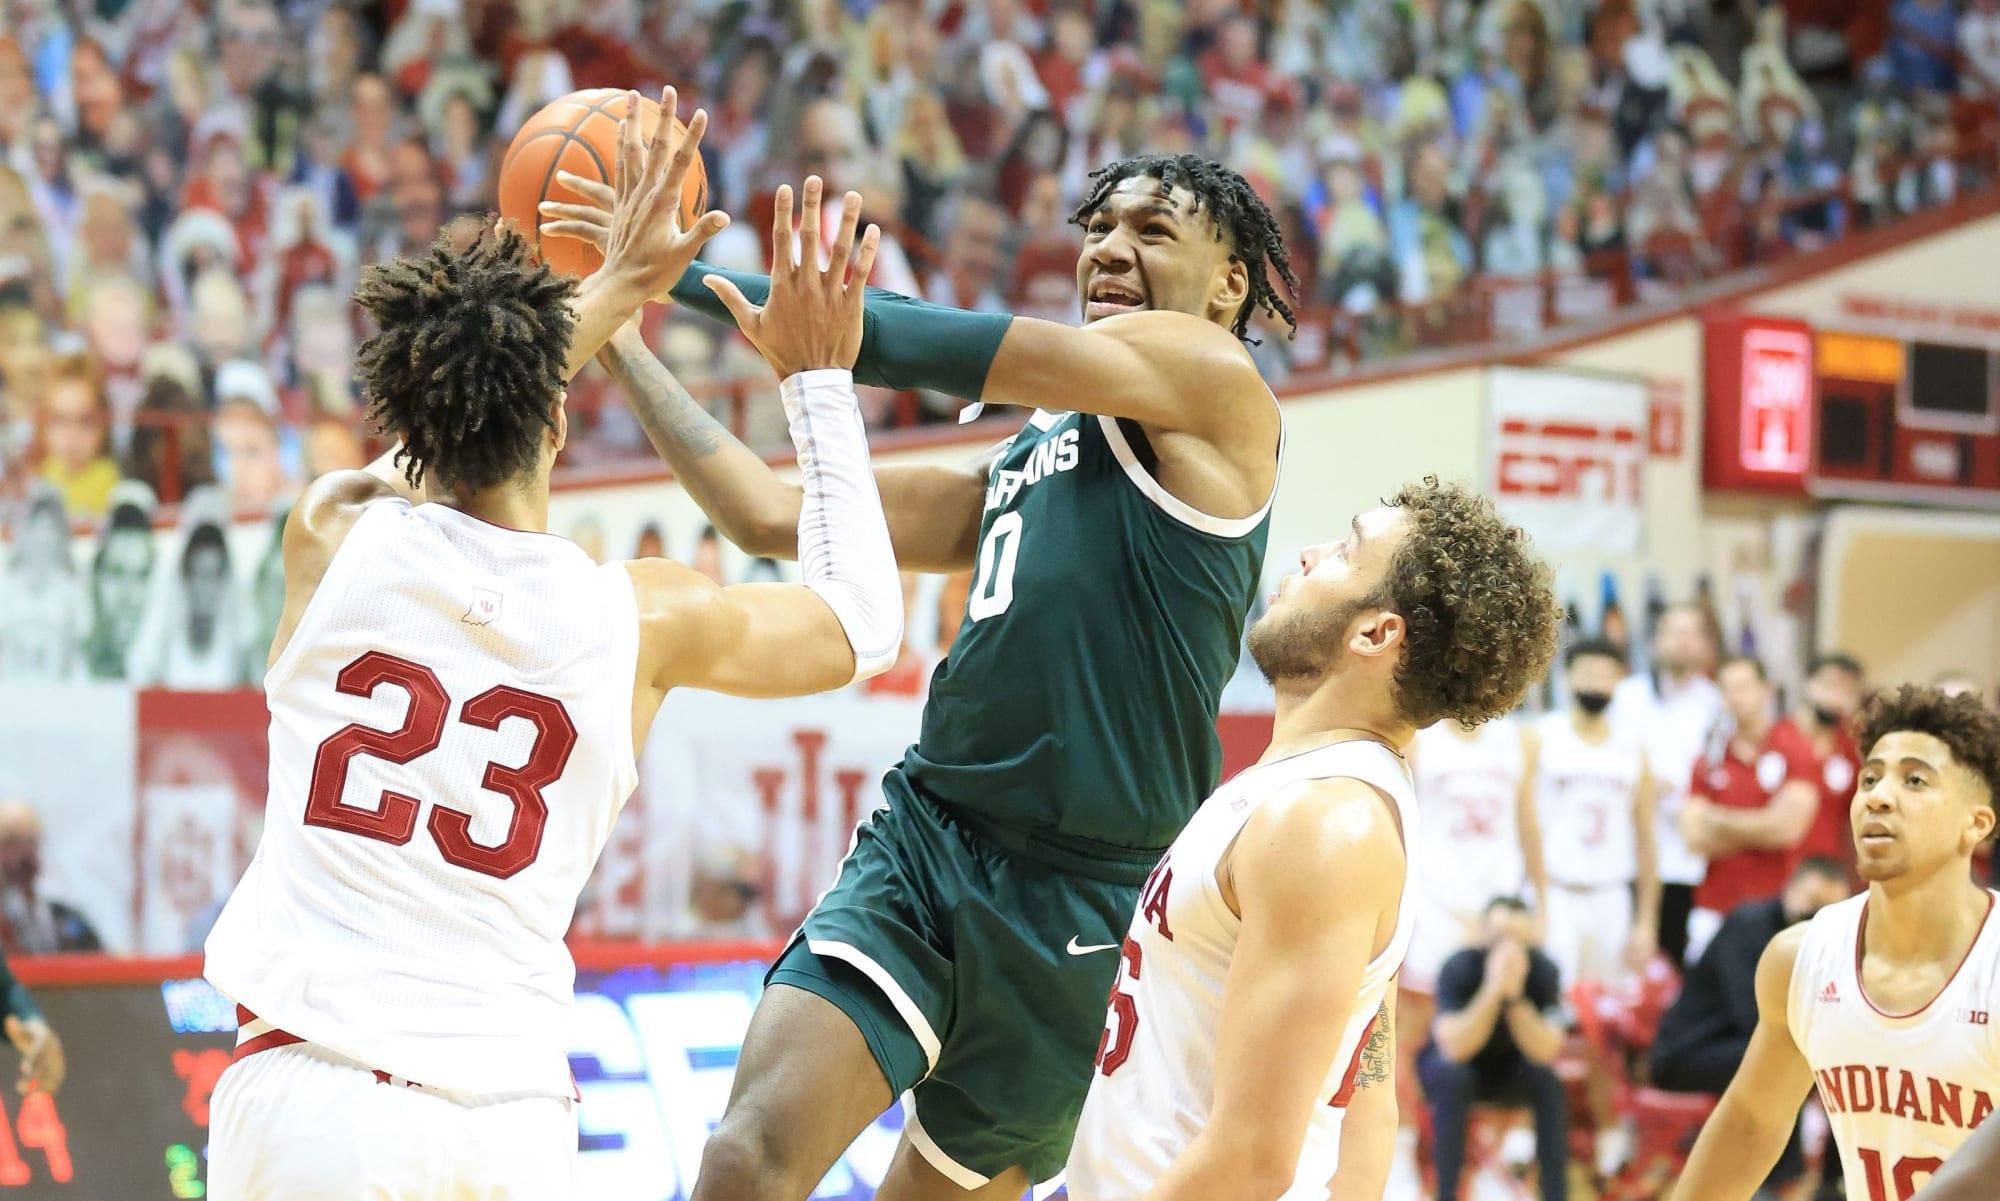 Jack Hoiberg Michigan State Spartans Basketball Jersey - Green